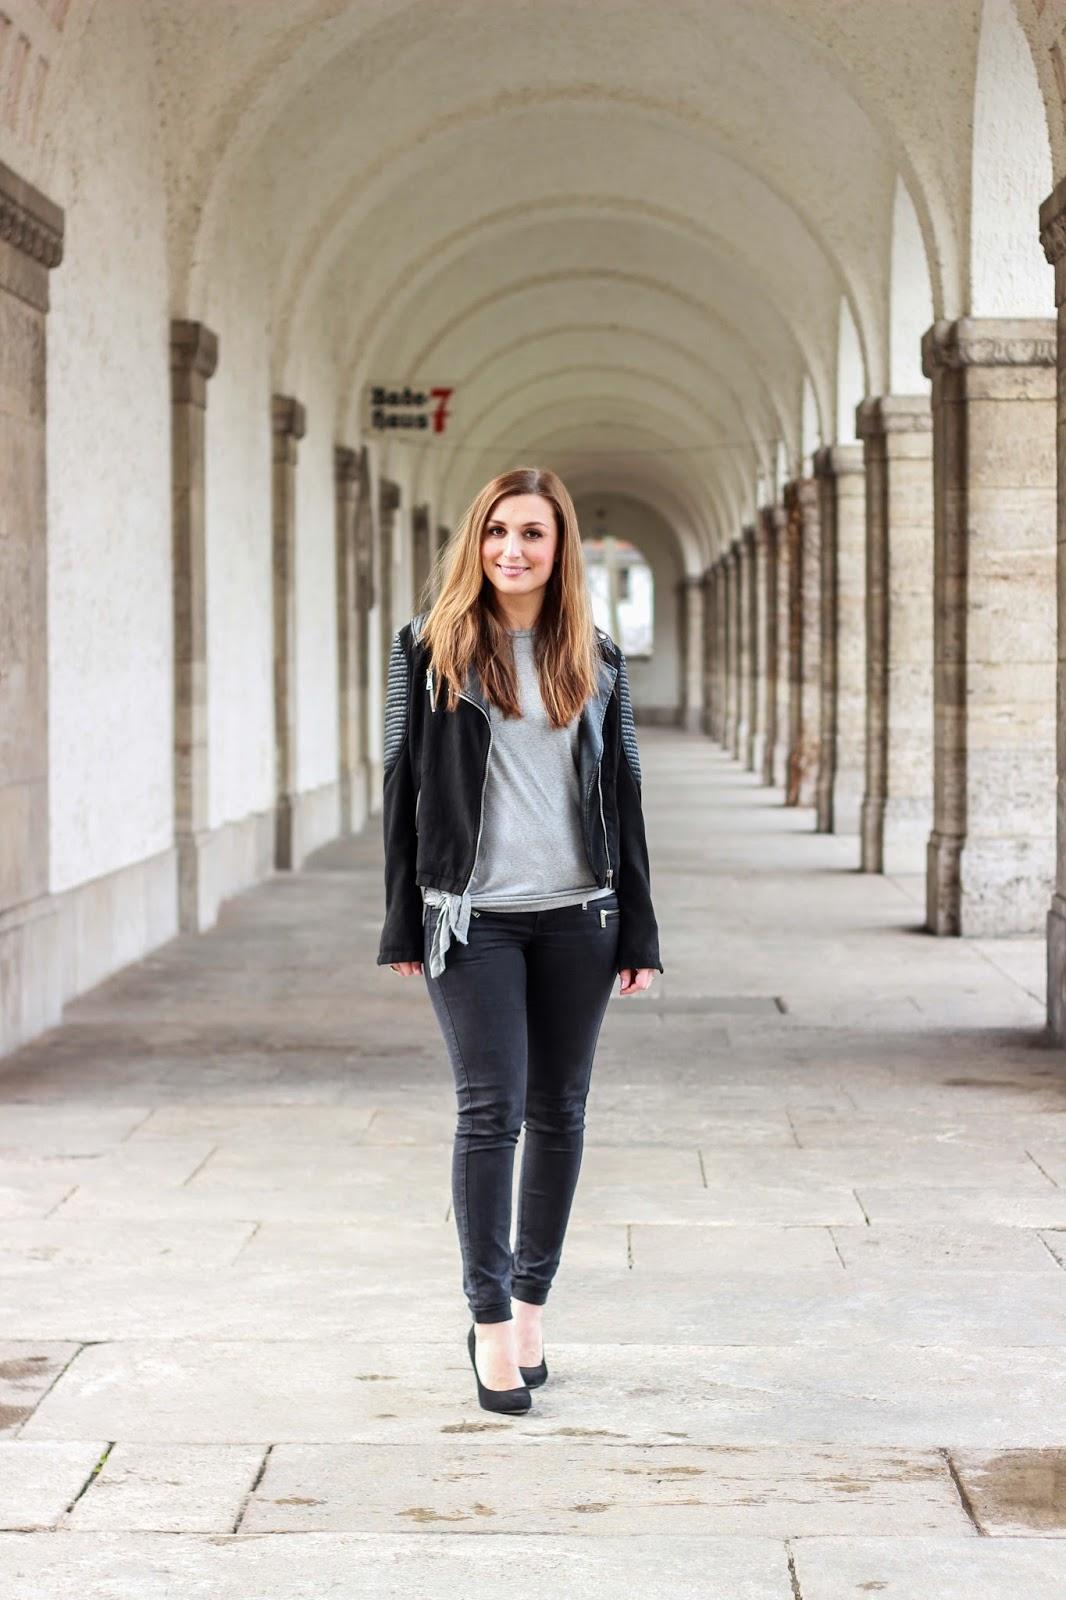 Outfit inspiration - Fashionstylebyjohanna in schwarzer Lederjacke - pink peonies - fashionhippieloves